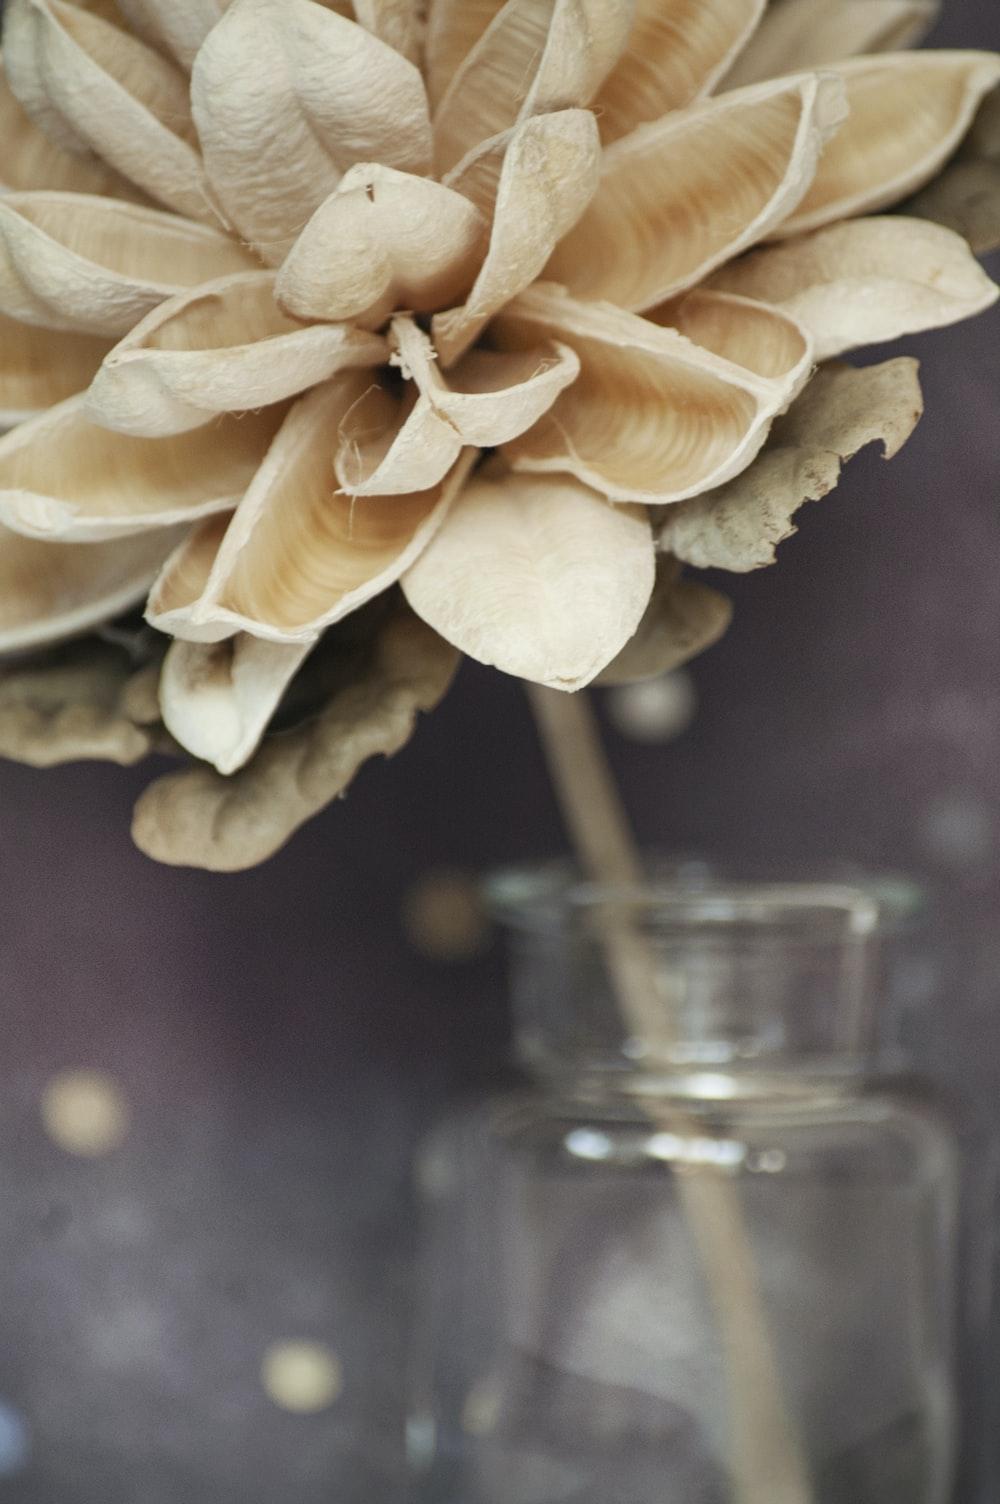 beige flower on clear glass vase